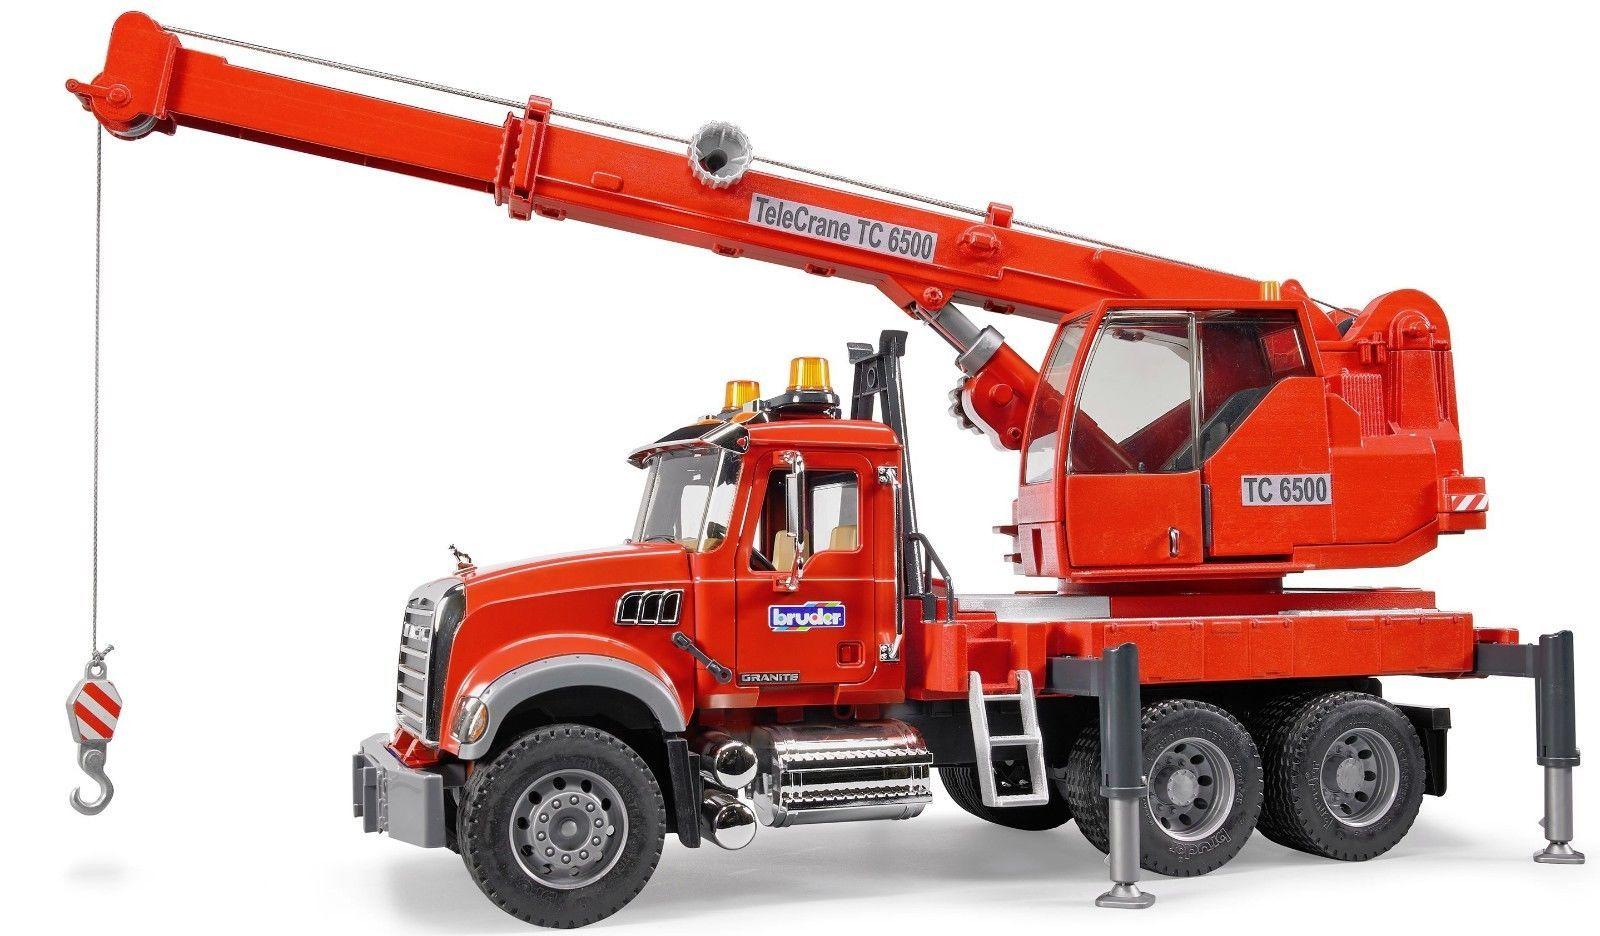 Bruder Toys Kids MACK Granite Crane Truck with Light and Sound Module 02826 NEW